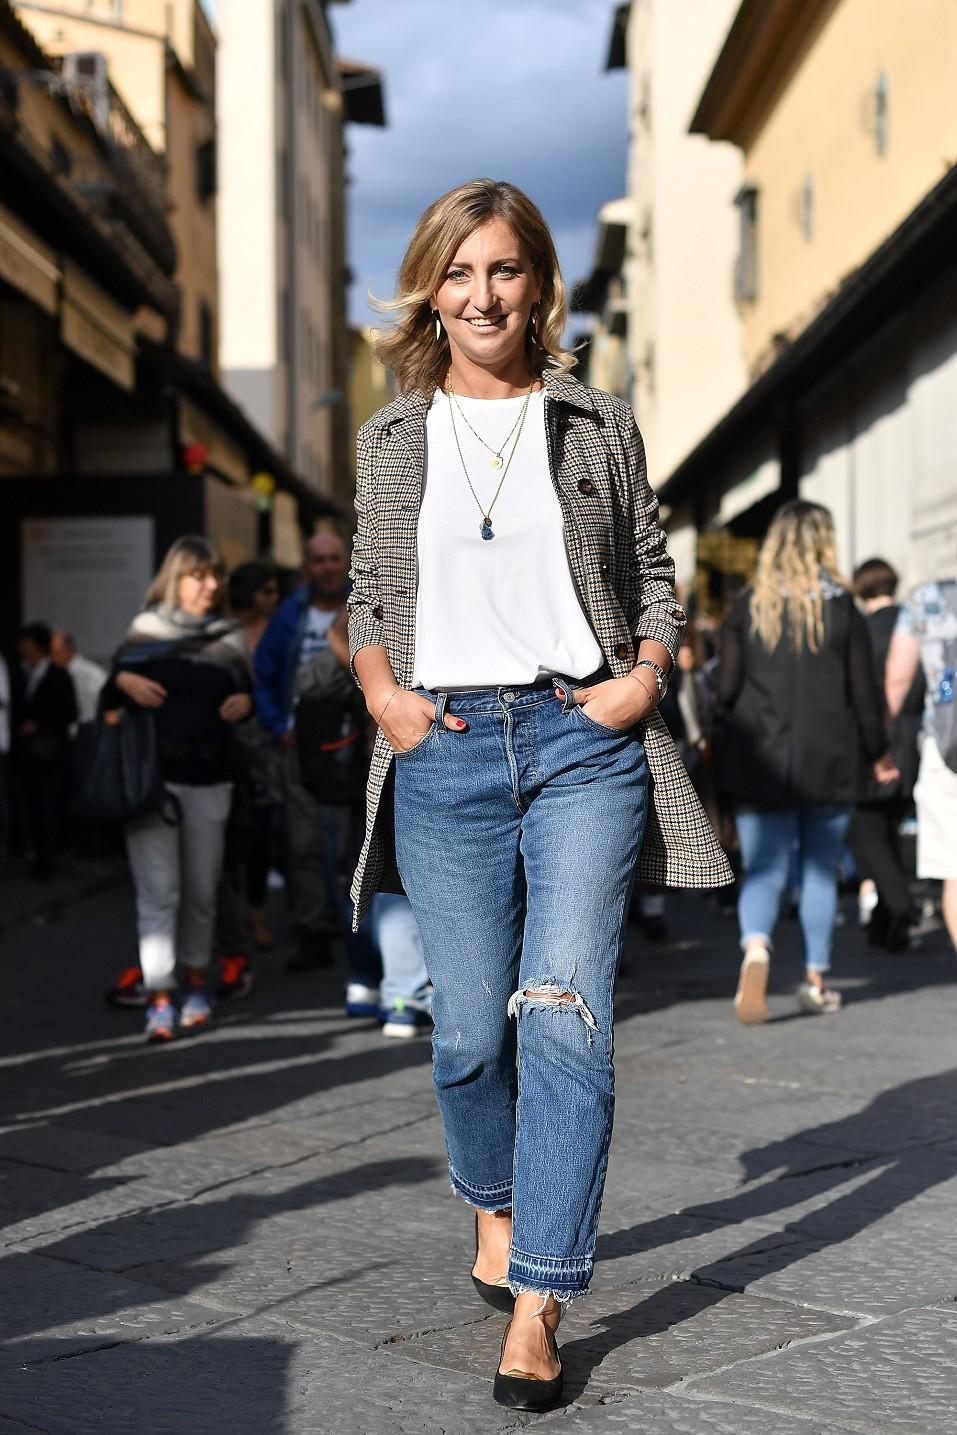 Elena Braghieri is seen wearing Peuterey jacket